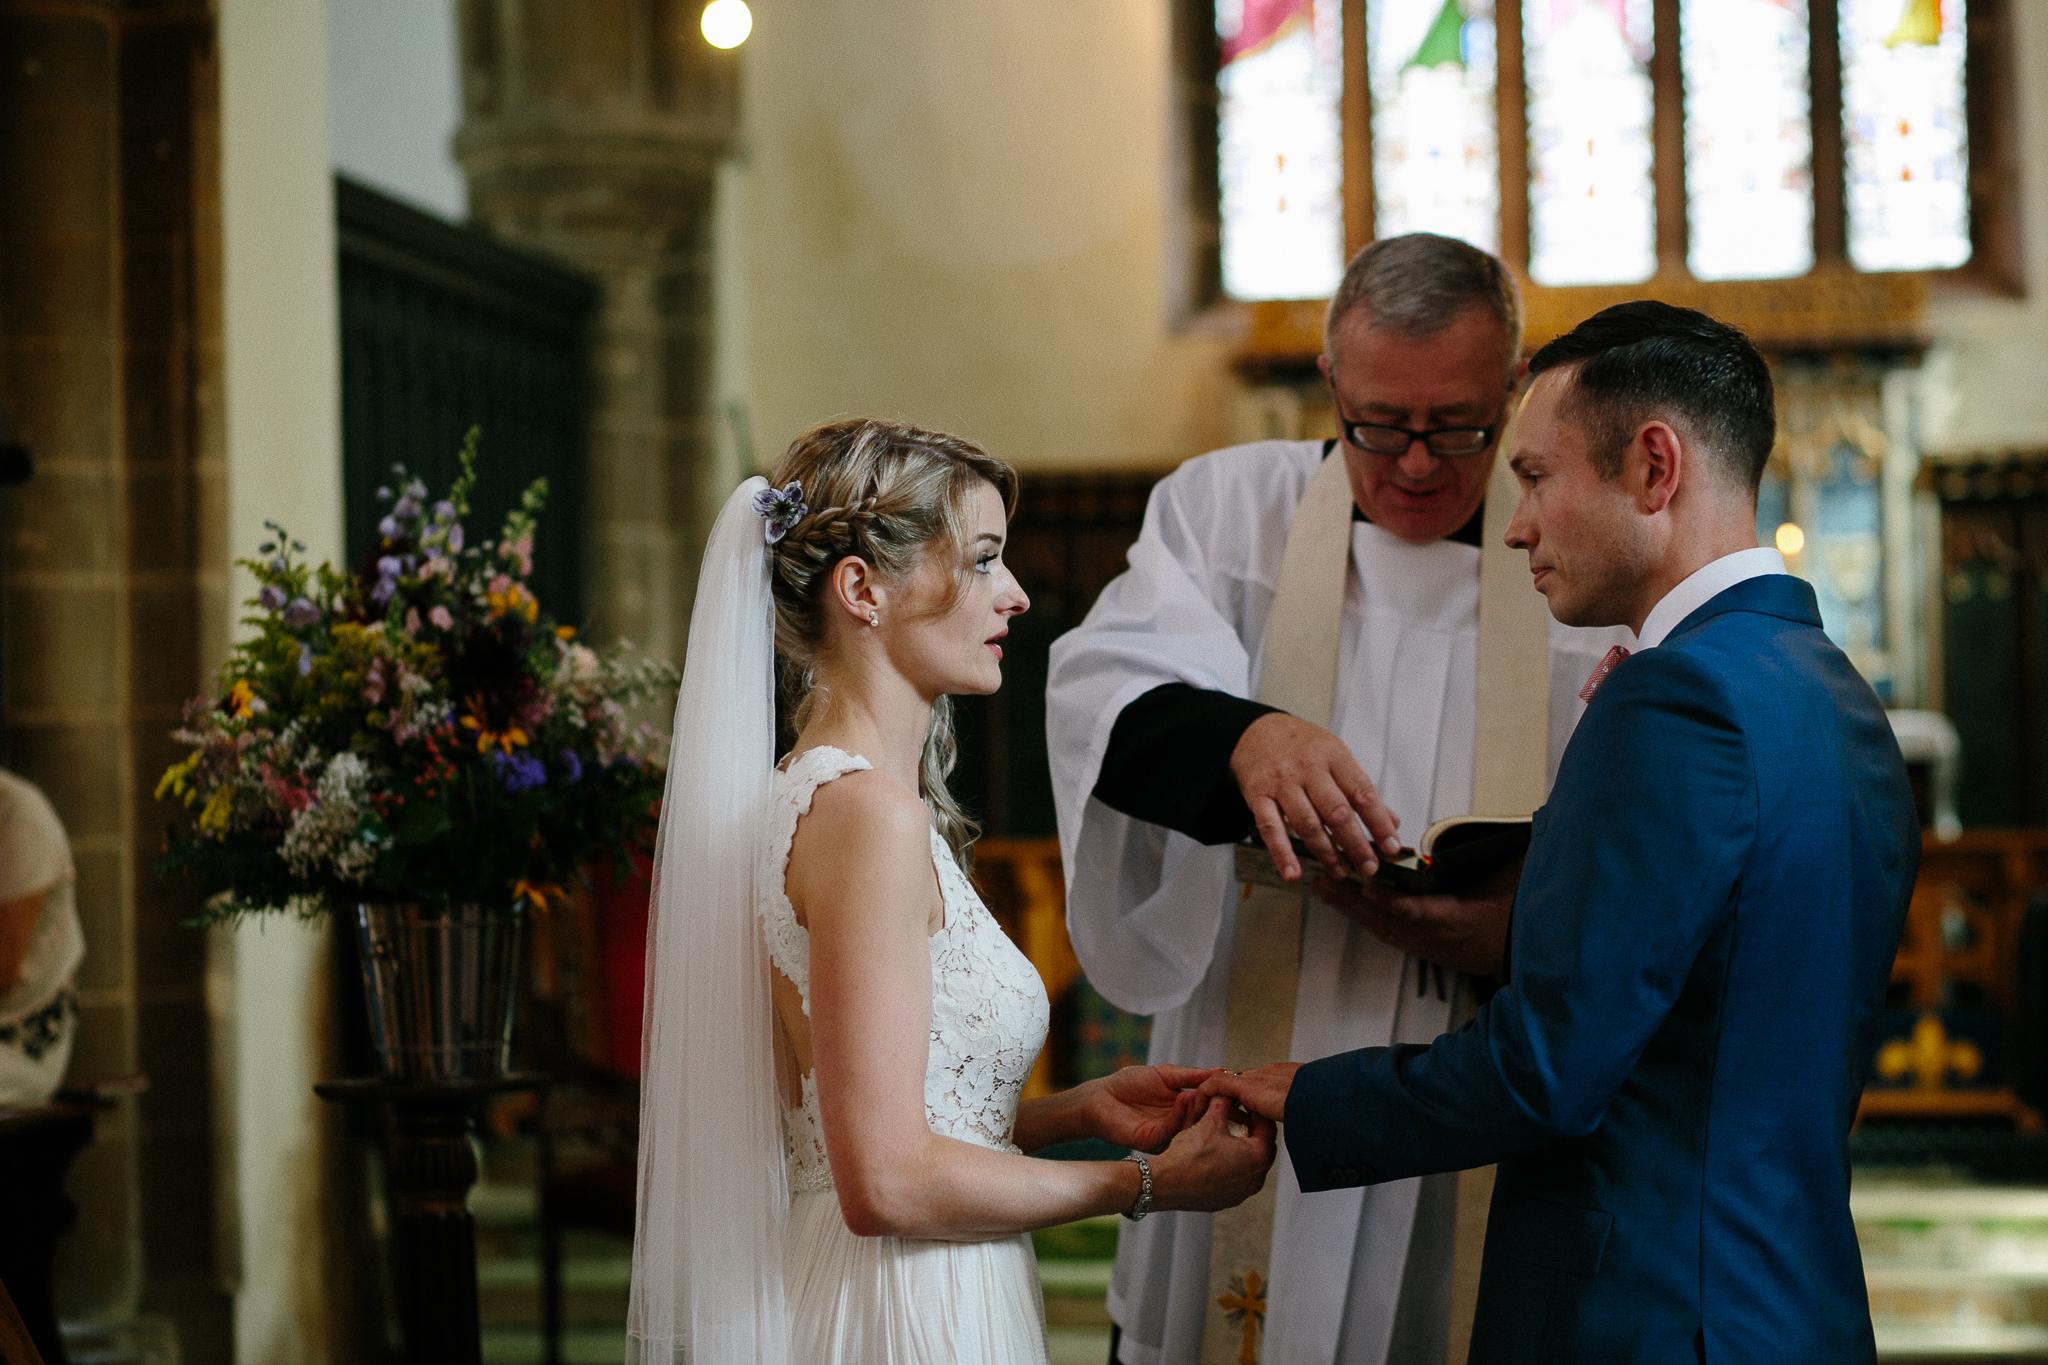 grantham_wedding_photographer-50.jpg